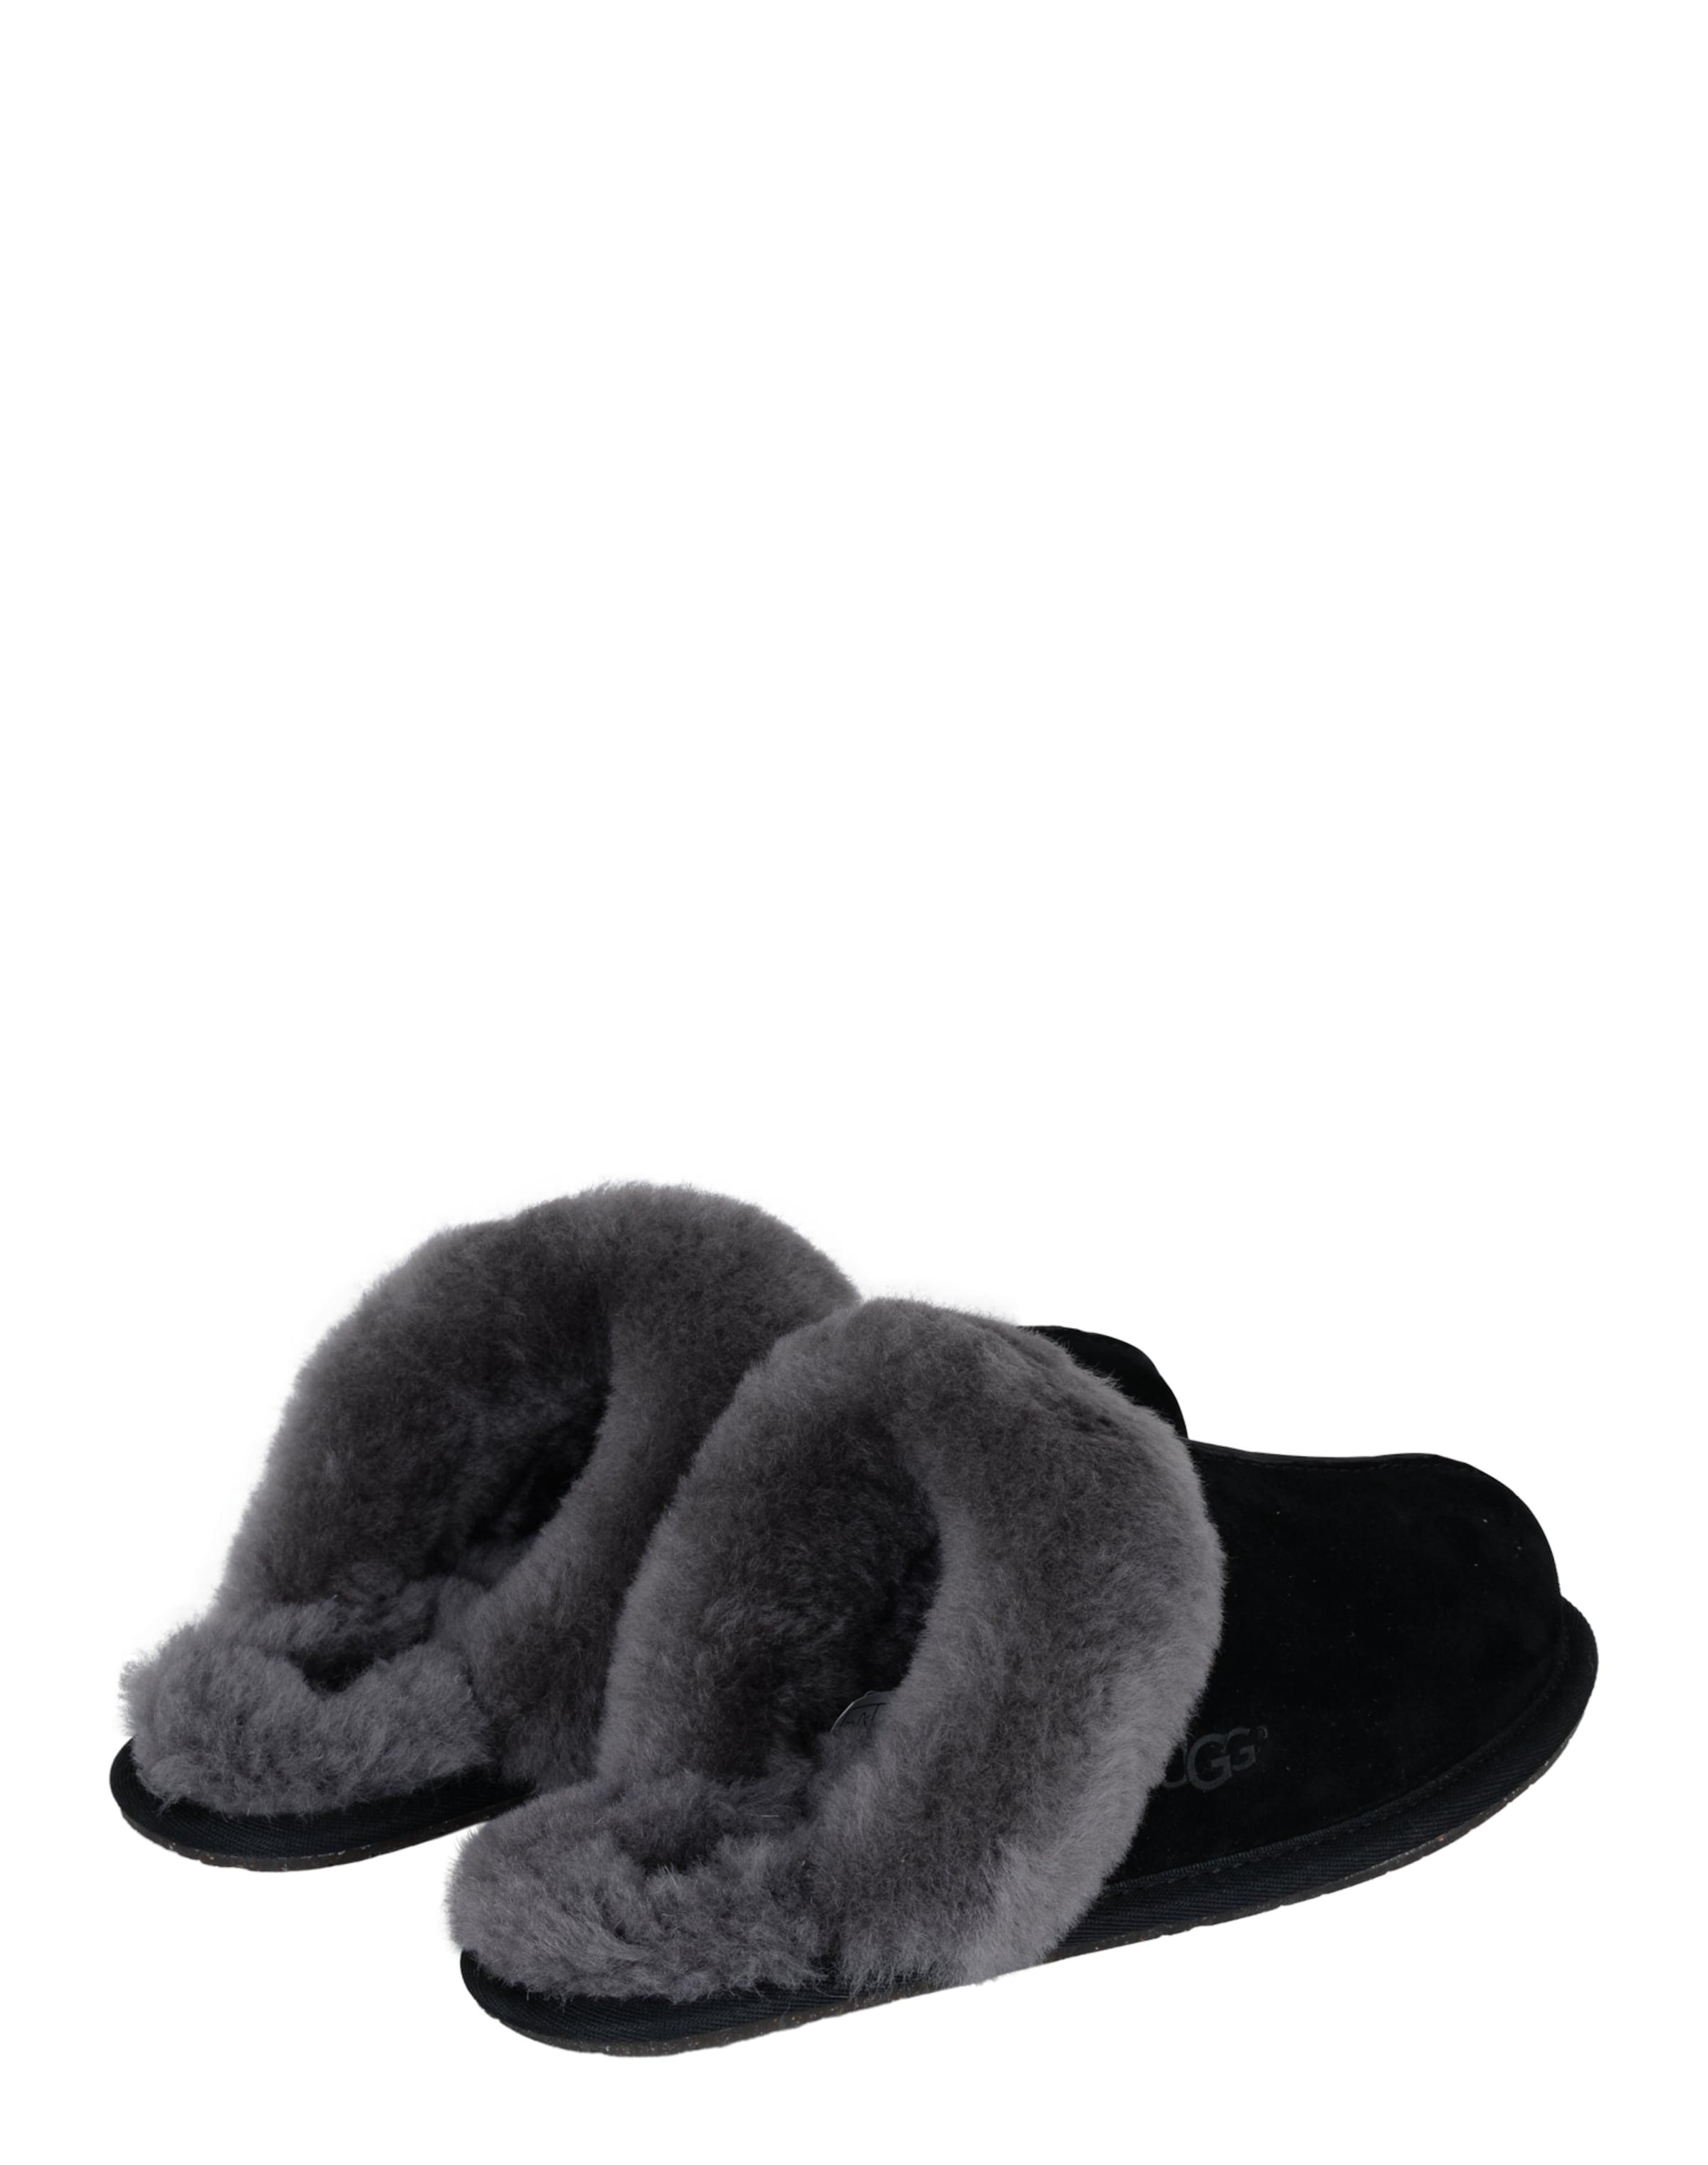 'scuffette' 'scuffette' En Pantoufle Pantoufle En Noir Ugg Ugg Noir Ajc543RLq